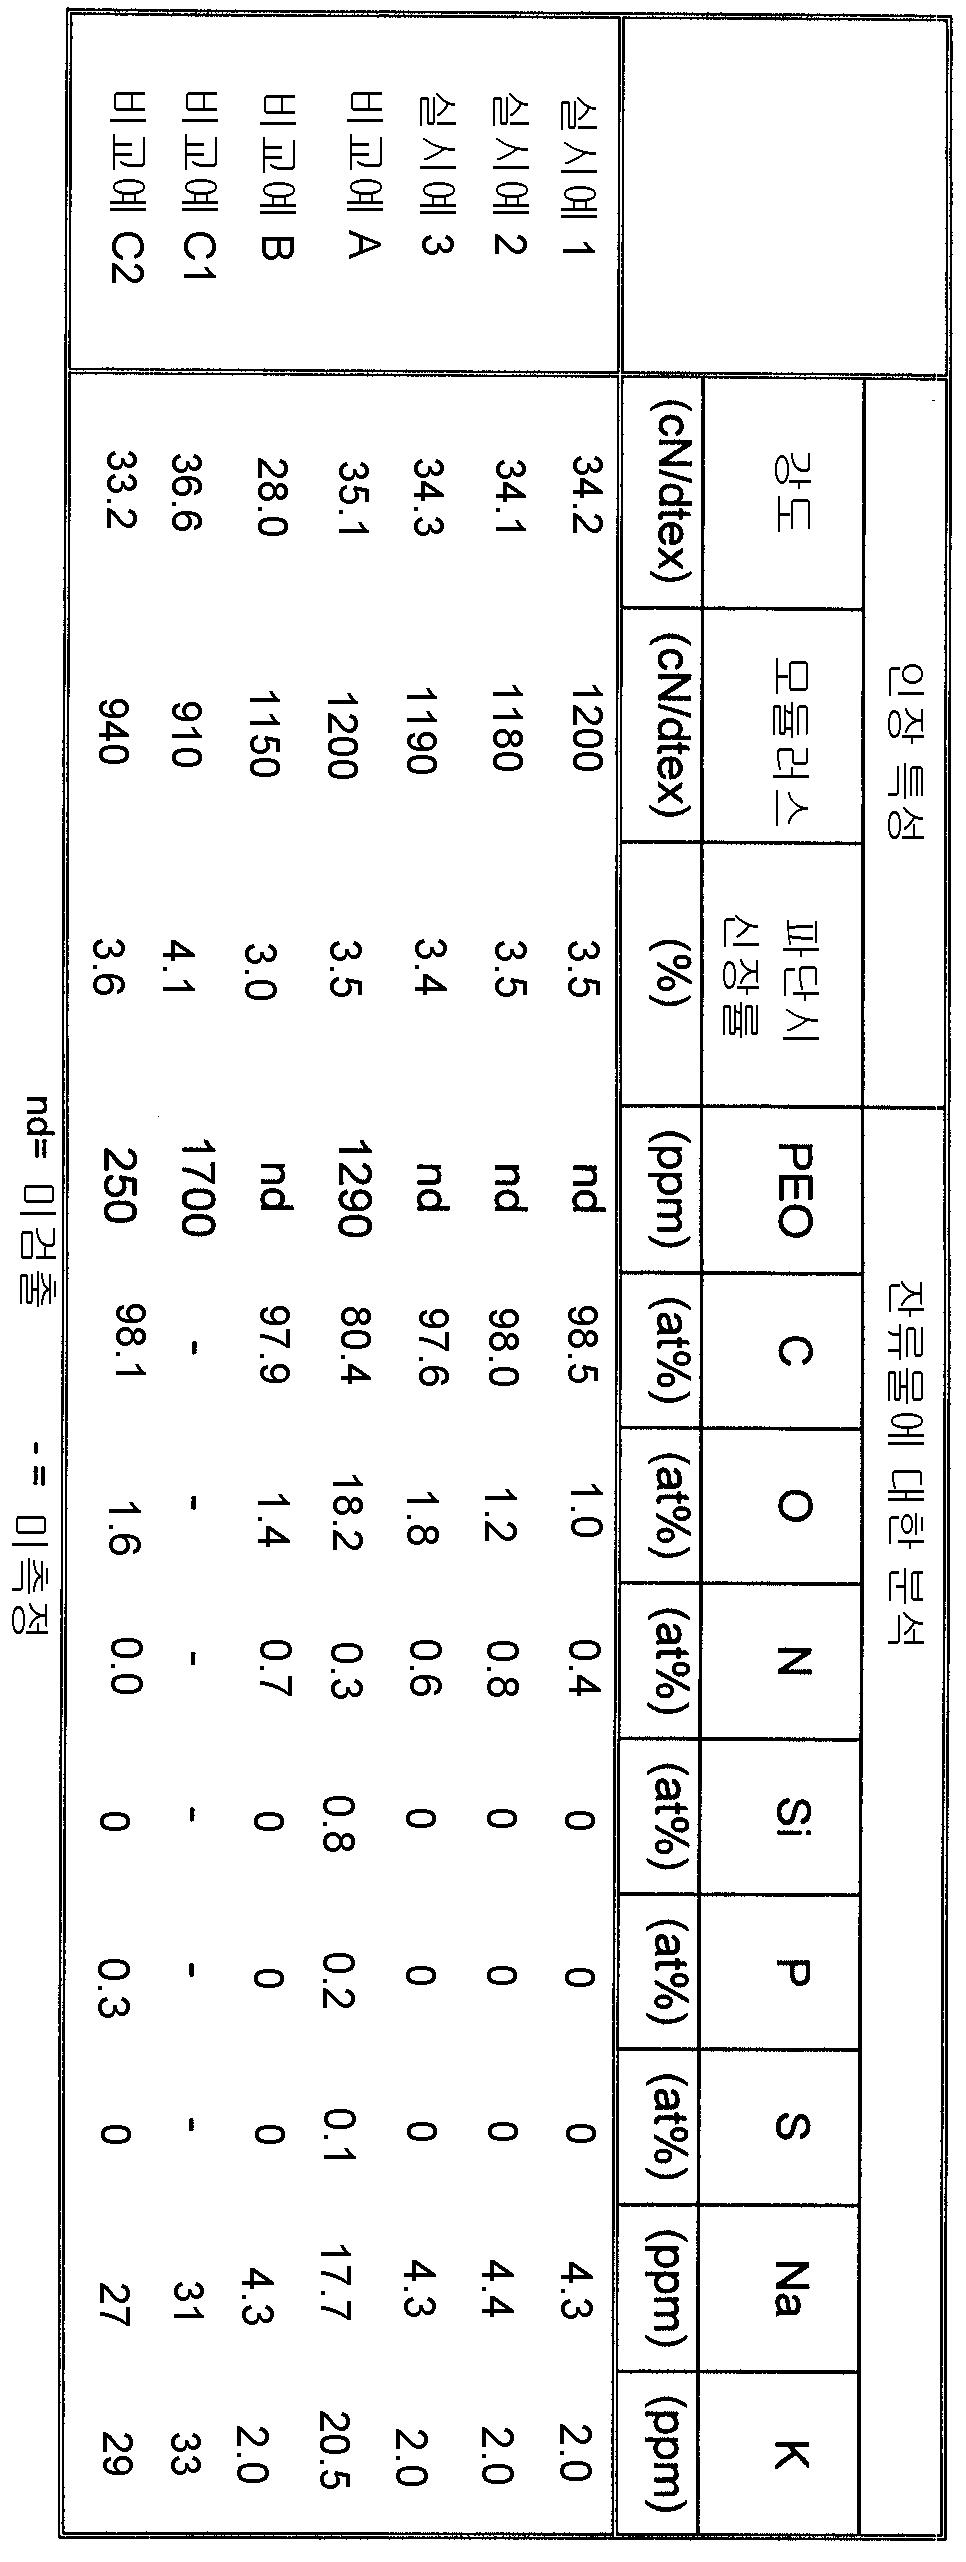 Figure 112005030825681-pct00001